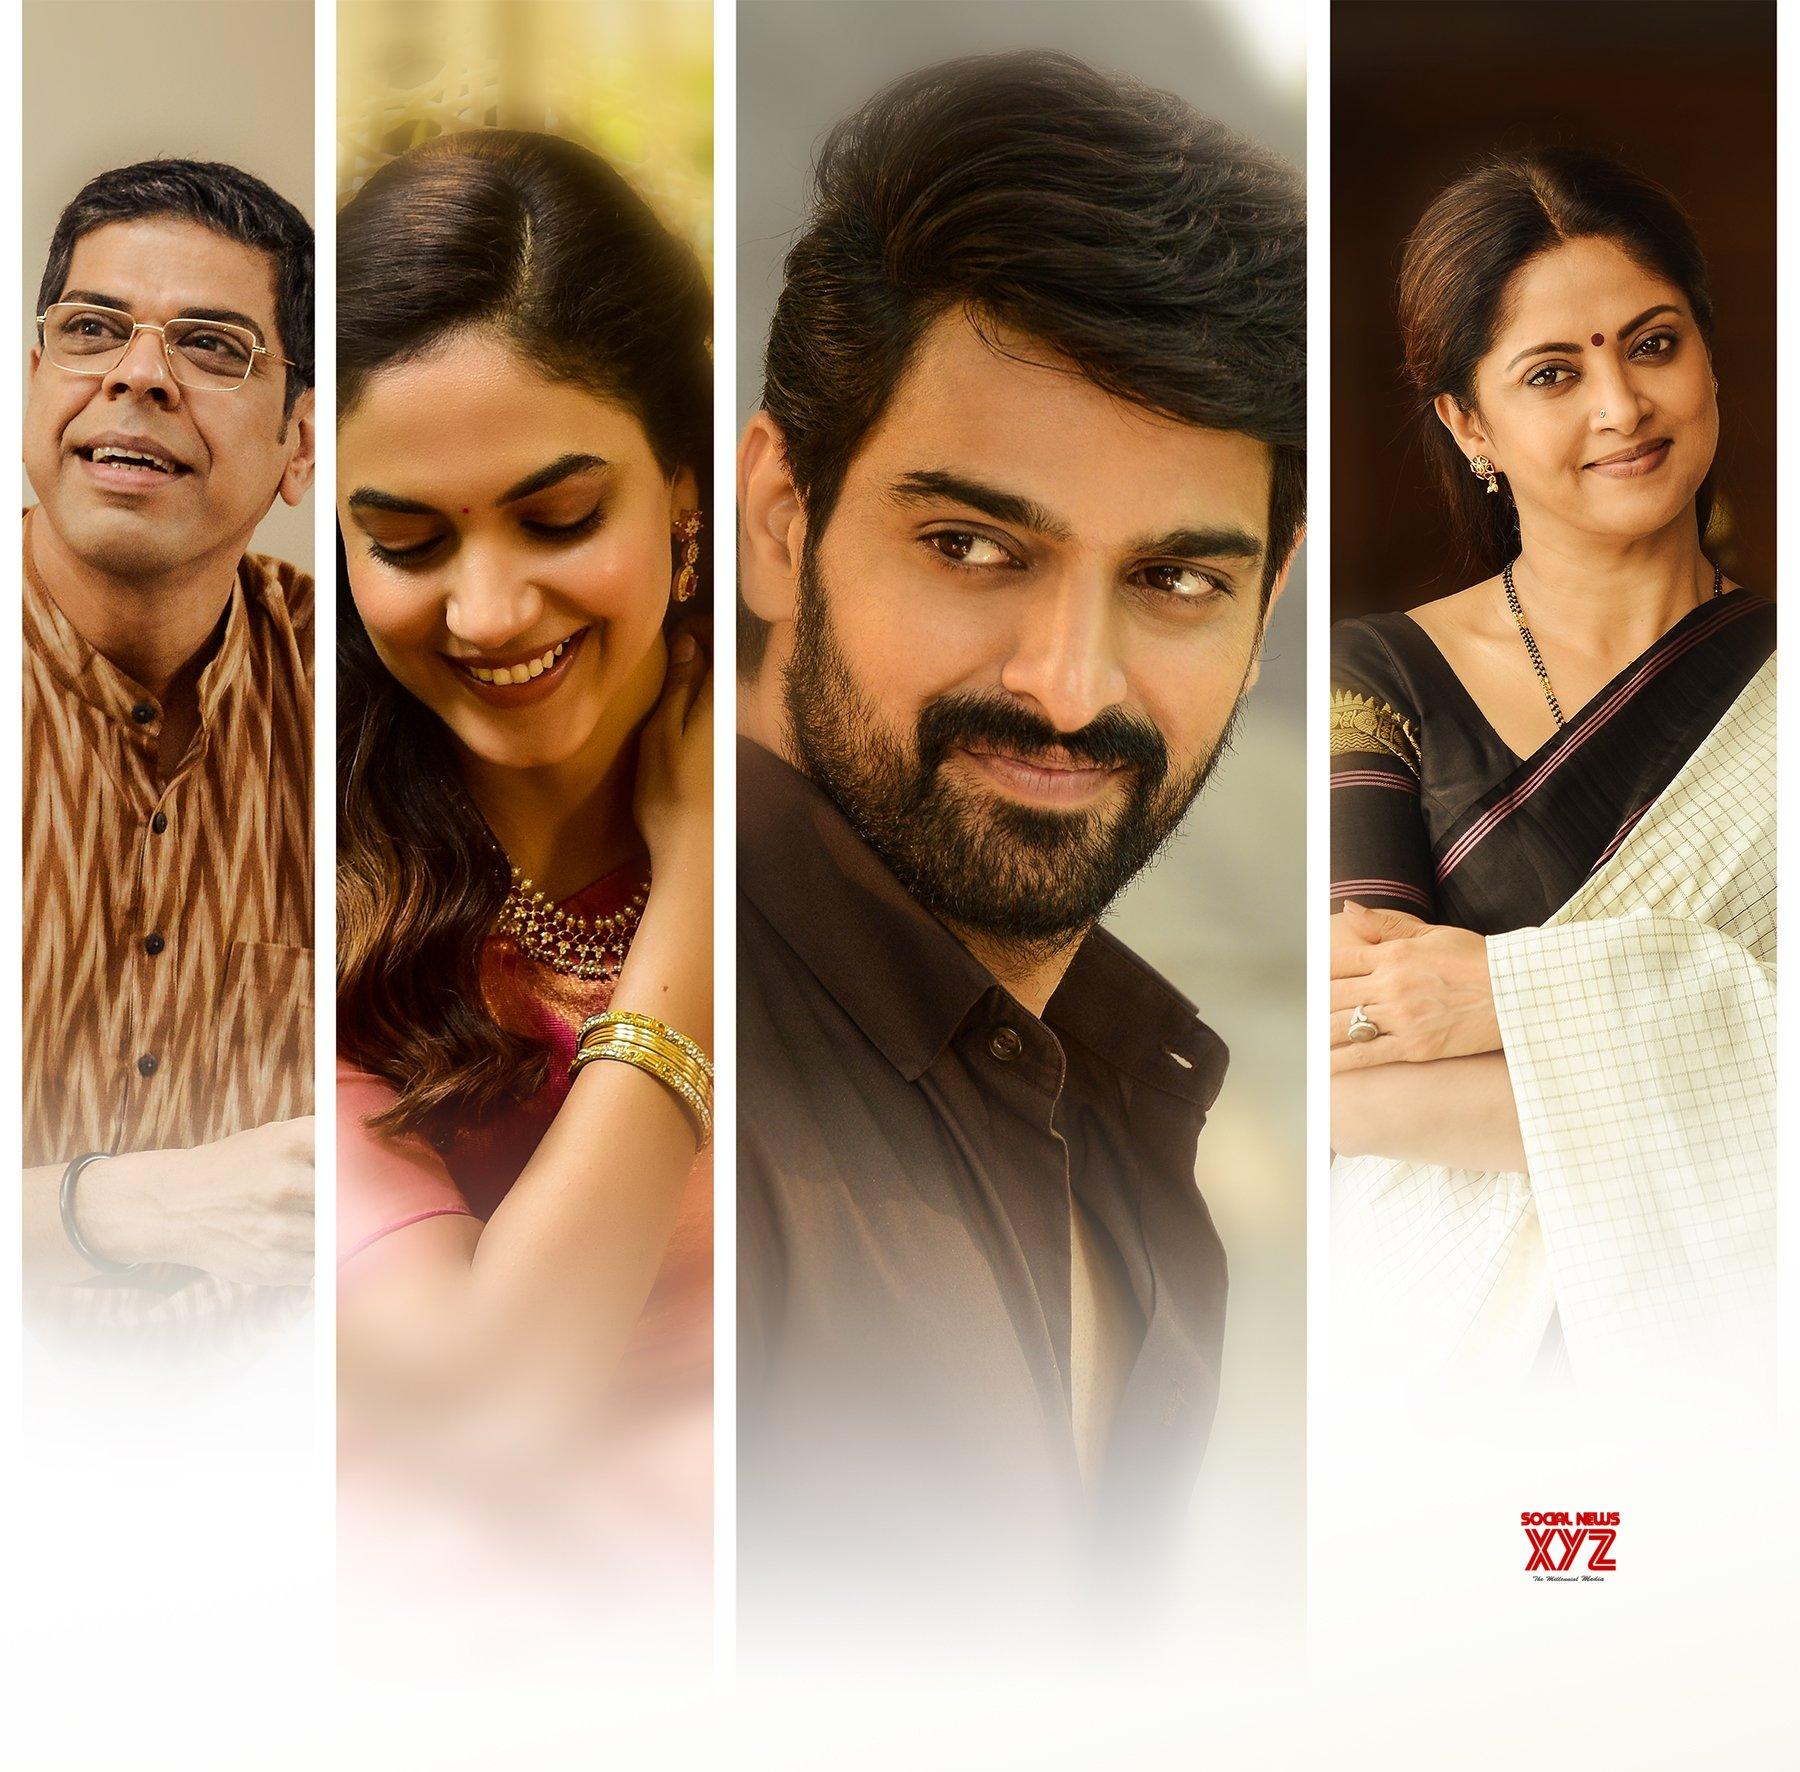 Rang De And Varudu Kaavalenu Sankranthi Movies Wishes HD Posters And Stills